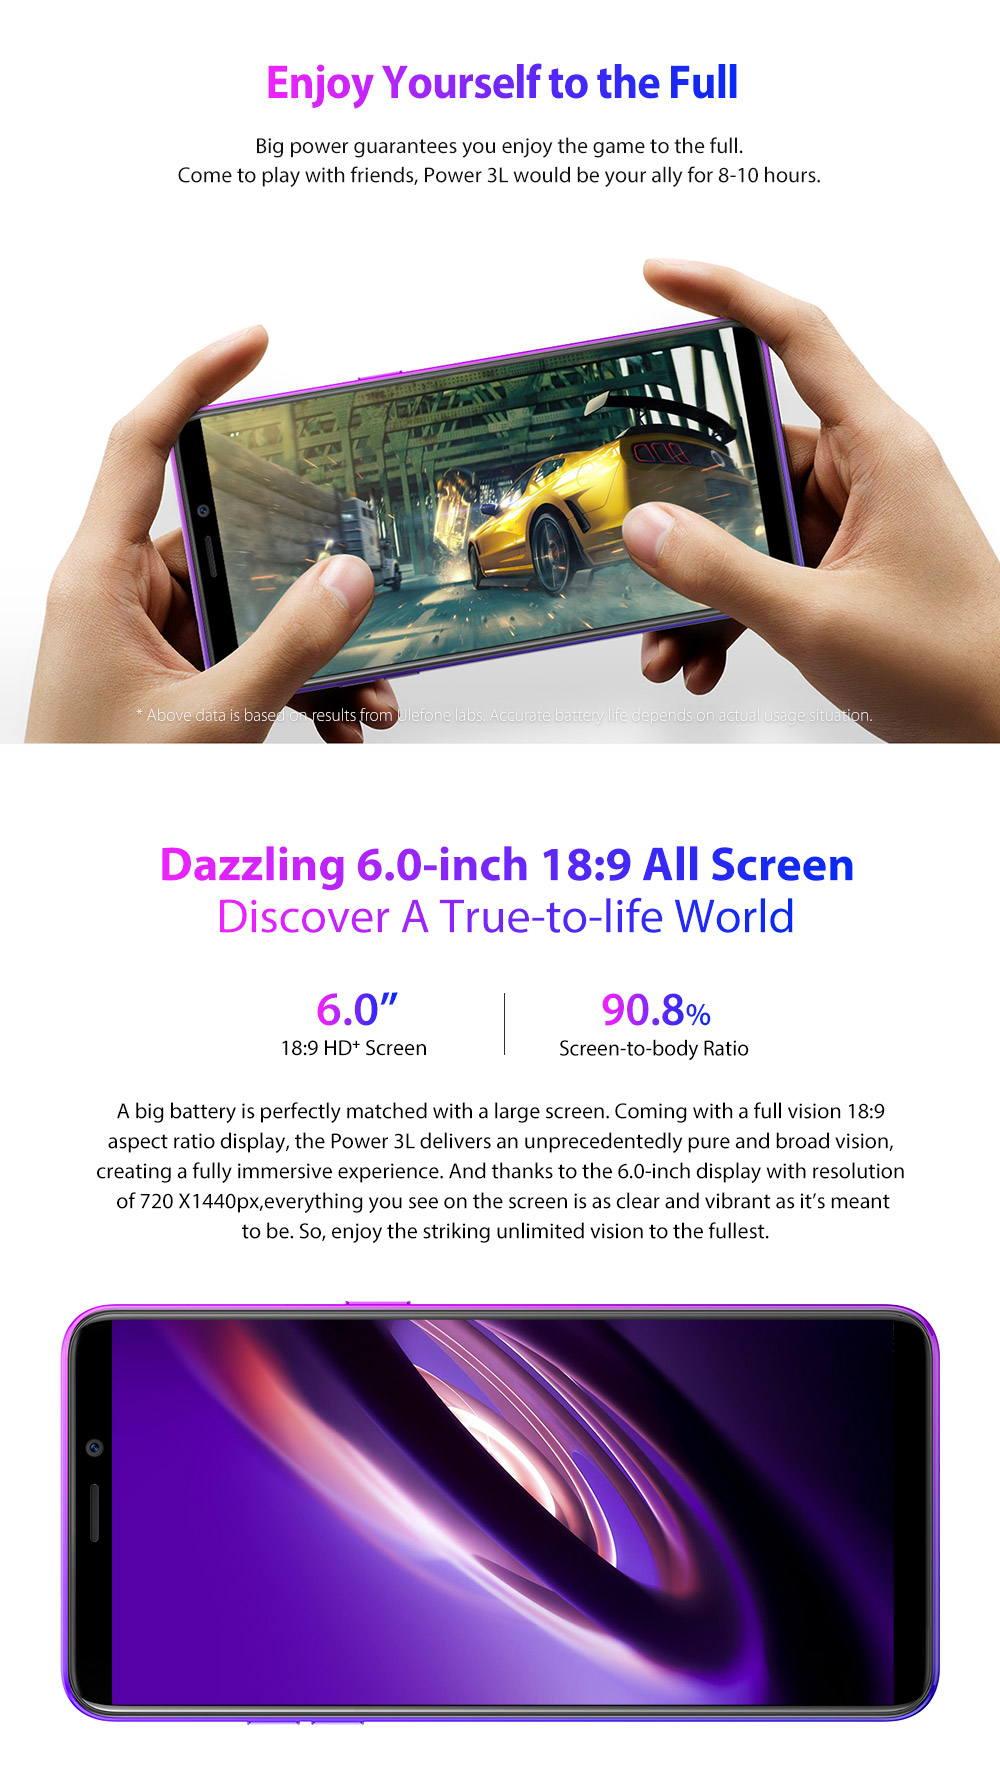 ulefone power 3l 4g smartphone price